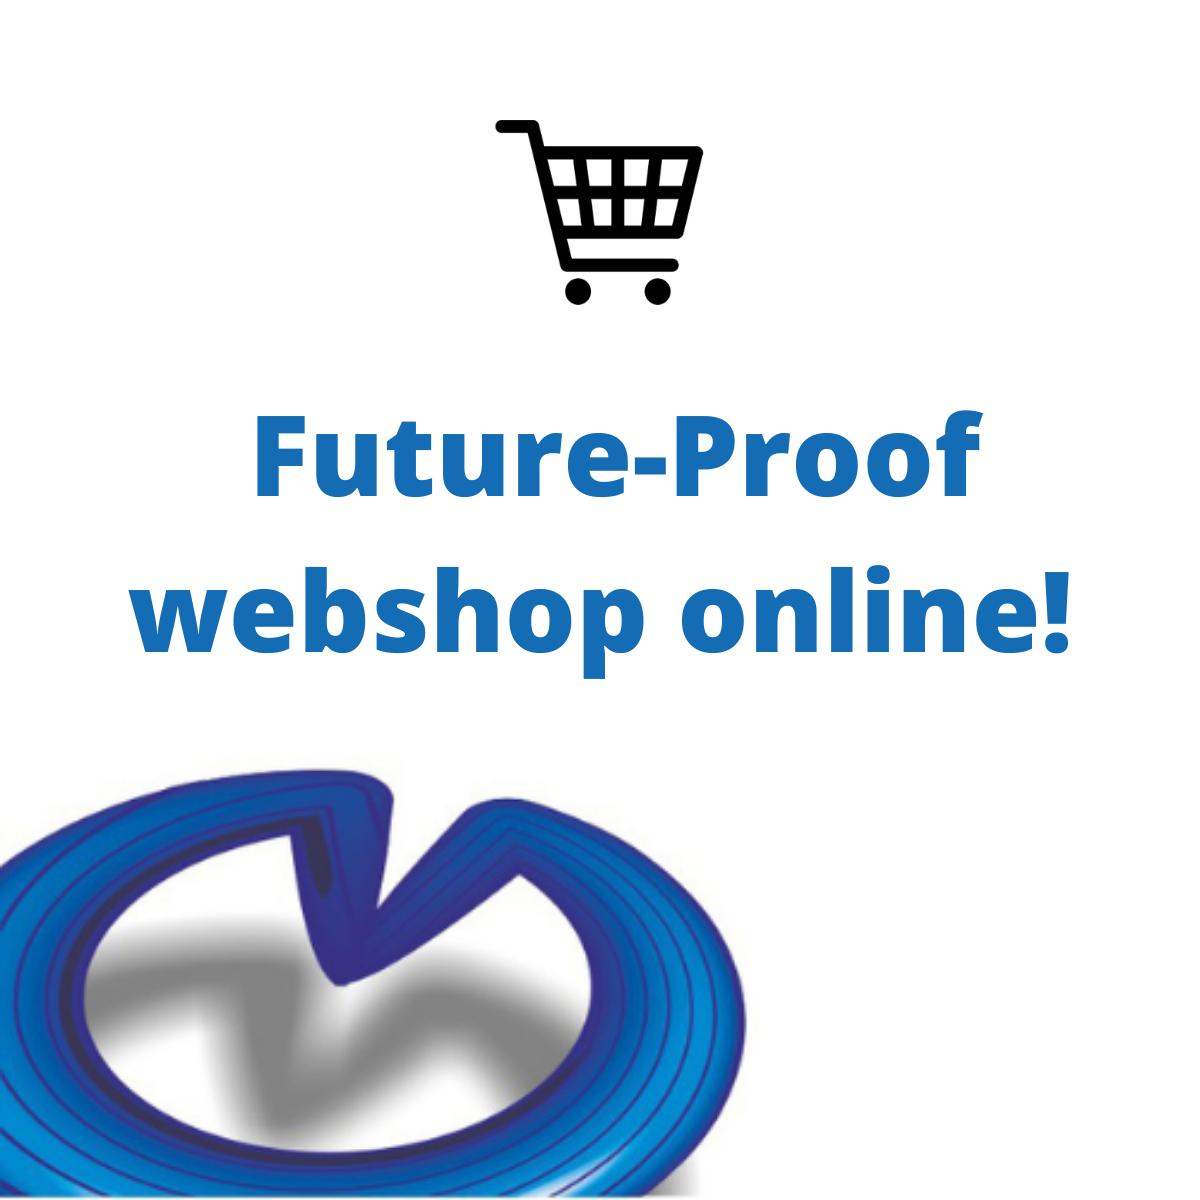 Webshop Future-Proof live!